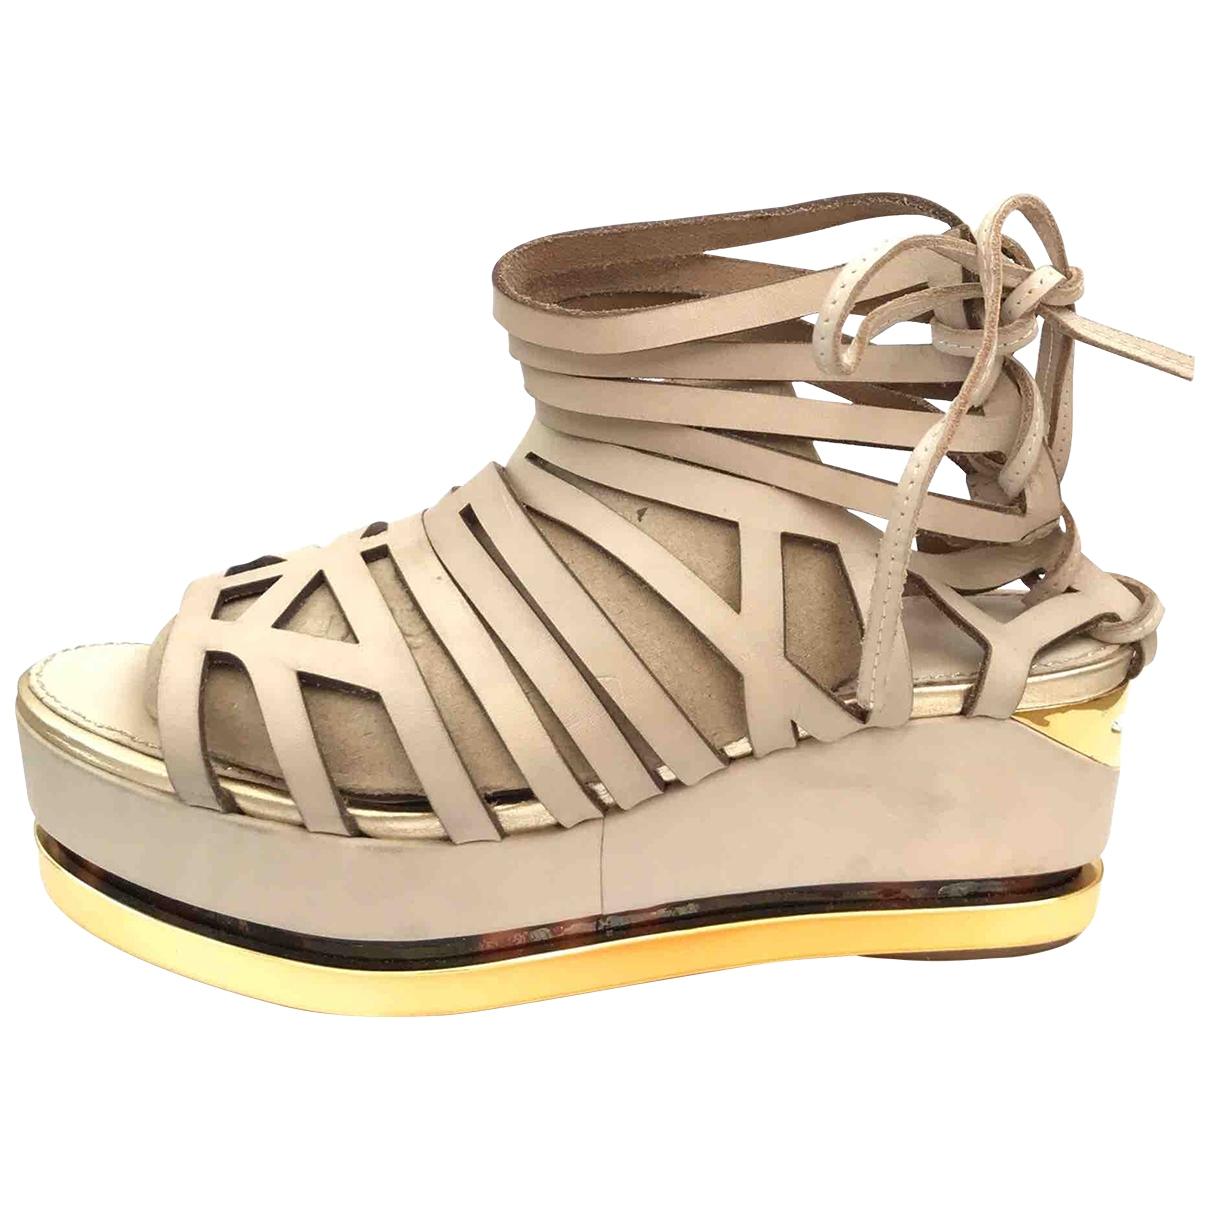 tophop Boutique \N Beige Leather Sandals for Women 36 EU